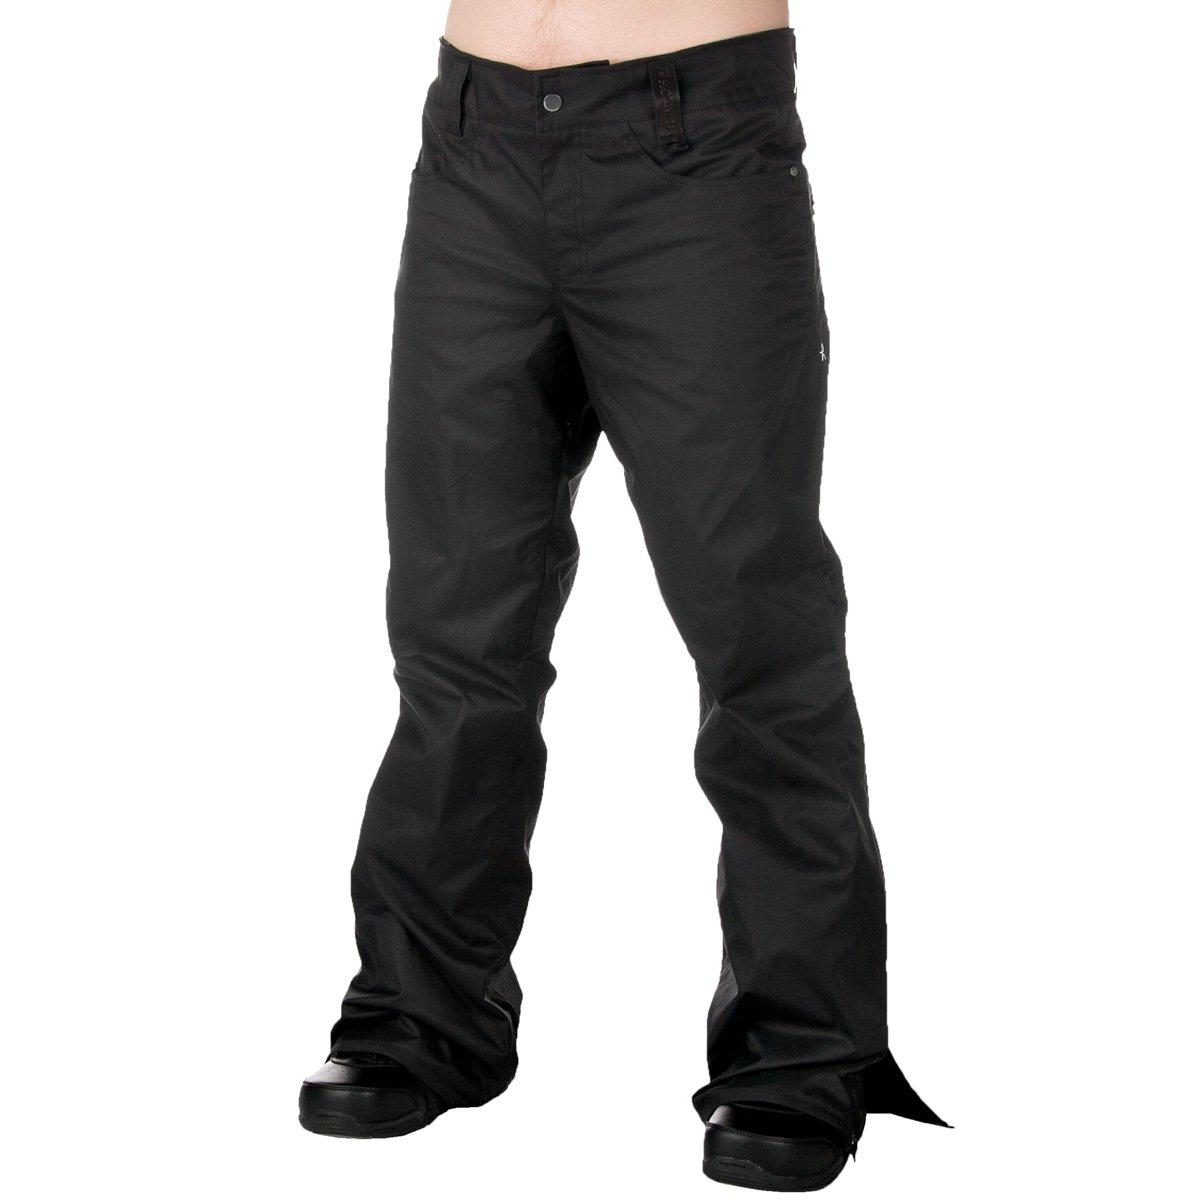 Herren Snowboard Hose Holden Standard Pant